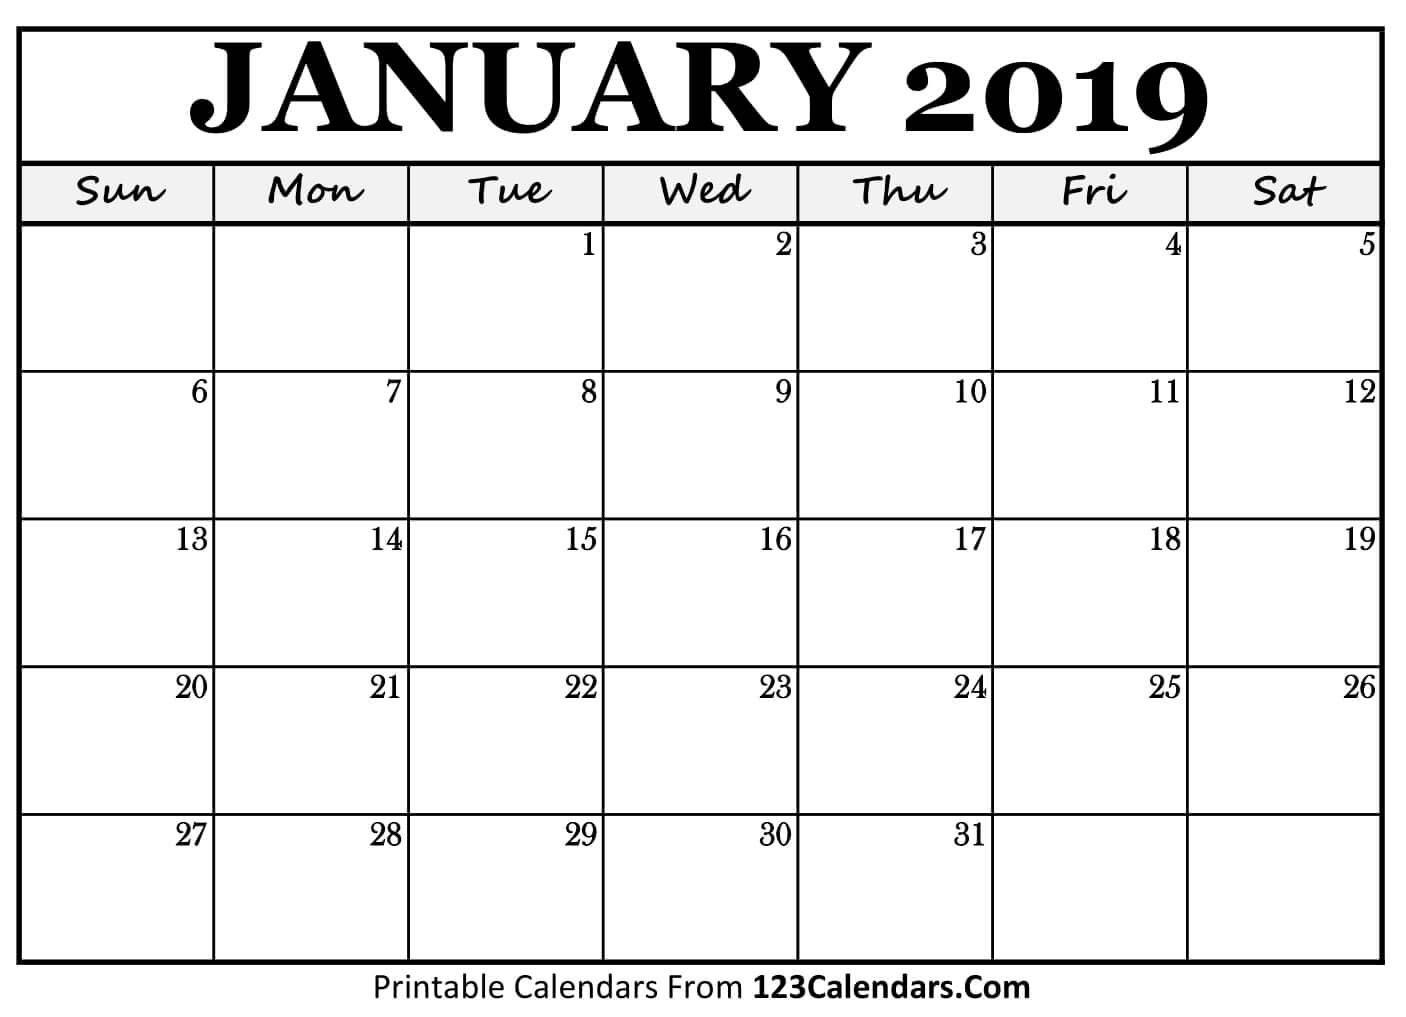 2019 Printable Calendar – 123Calendars Calendar 2019 For Print